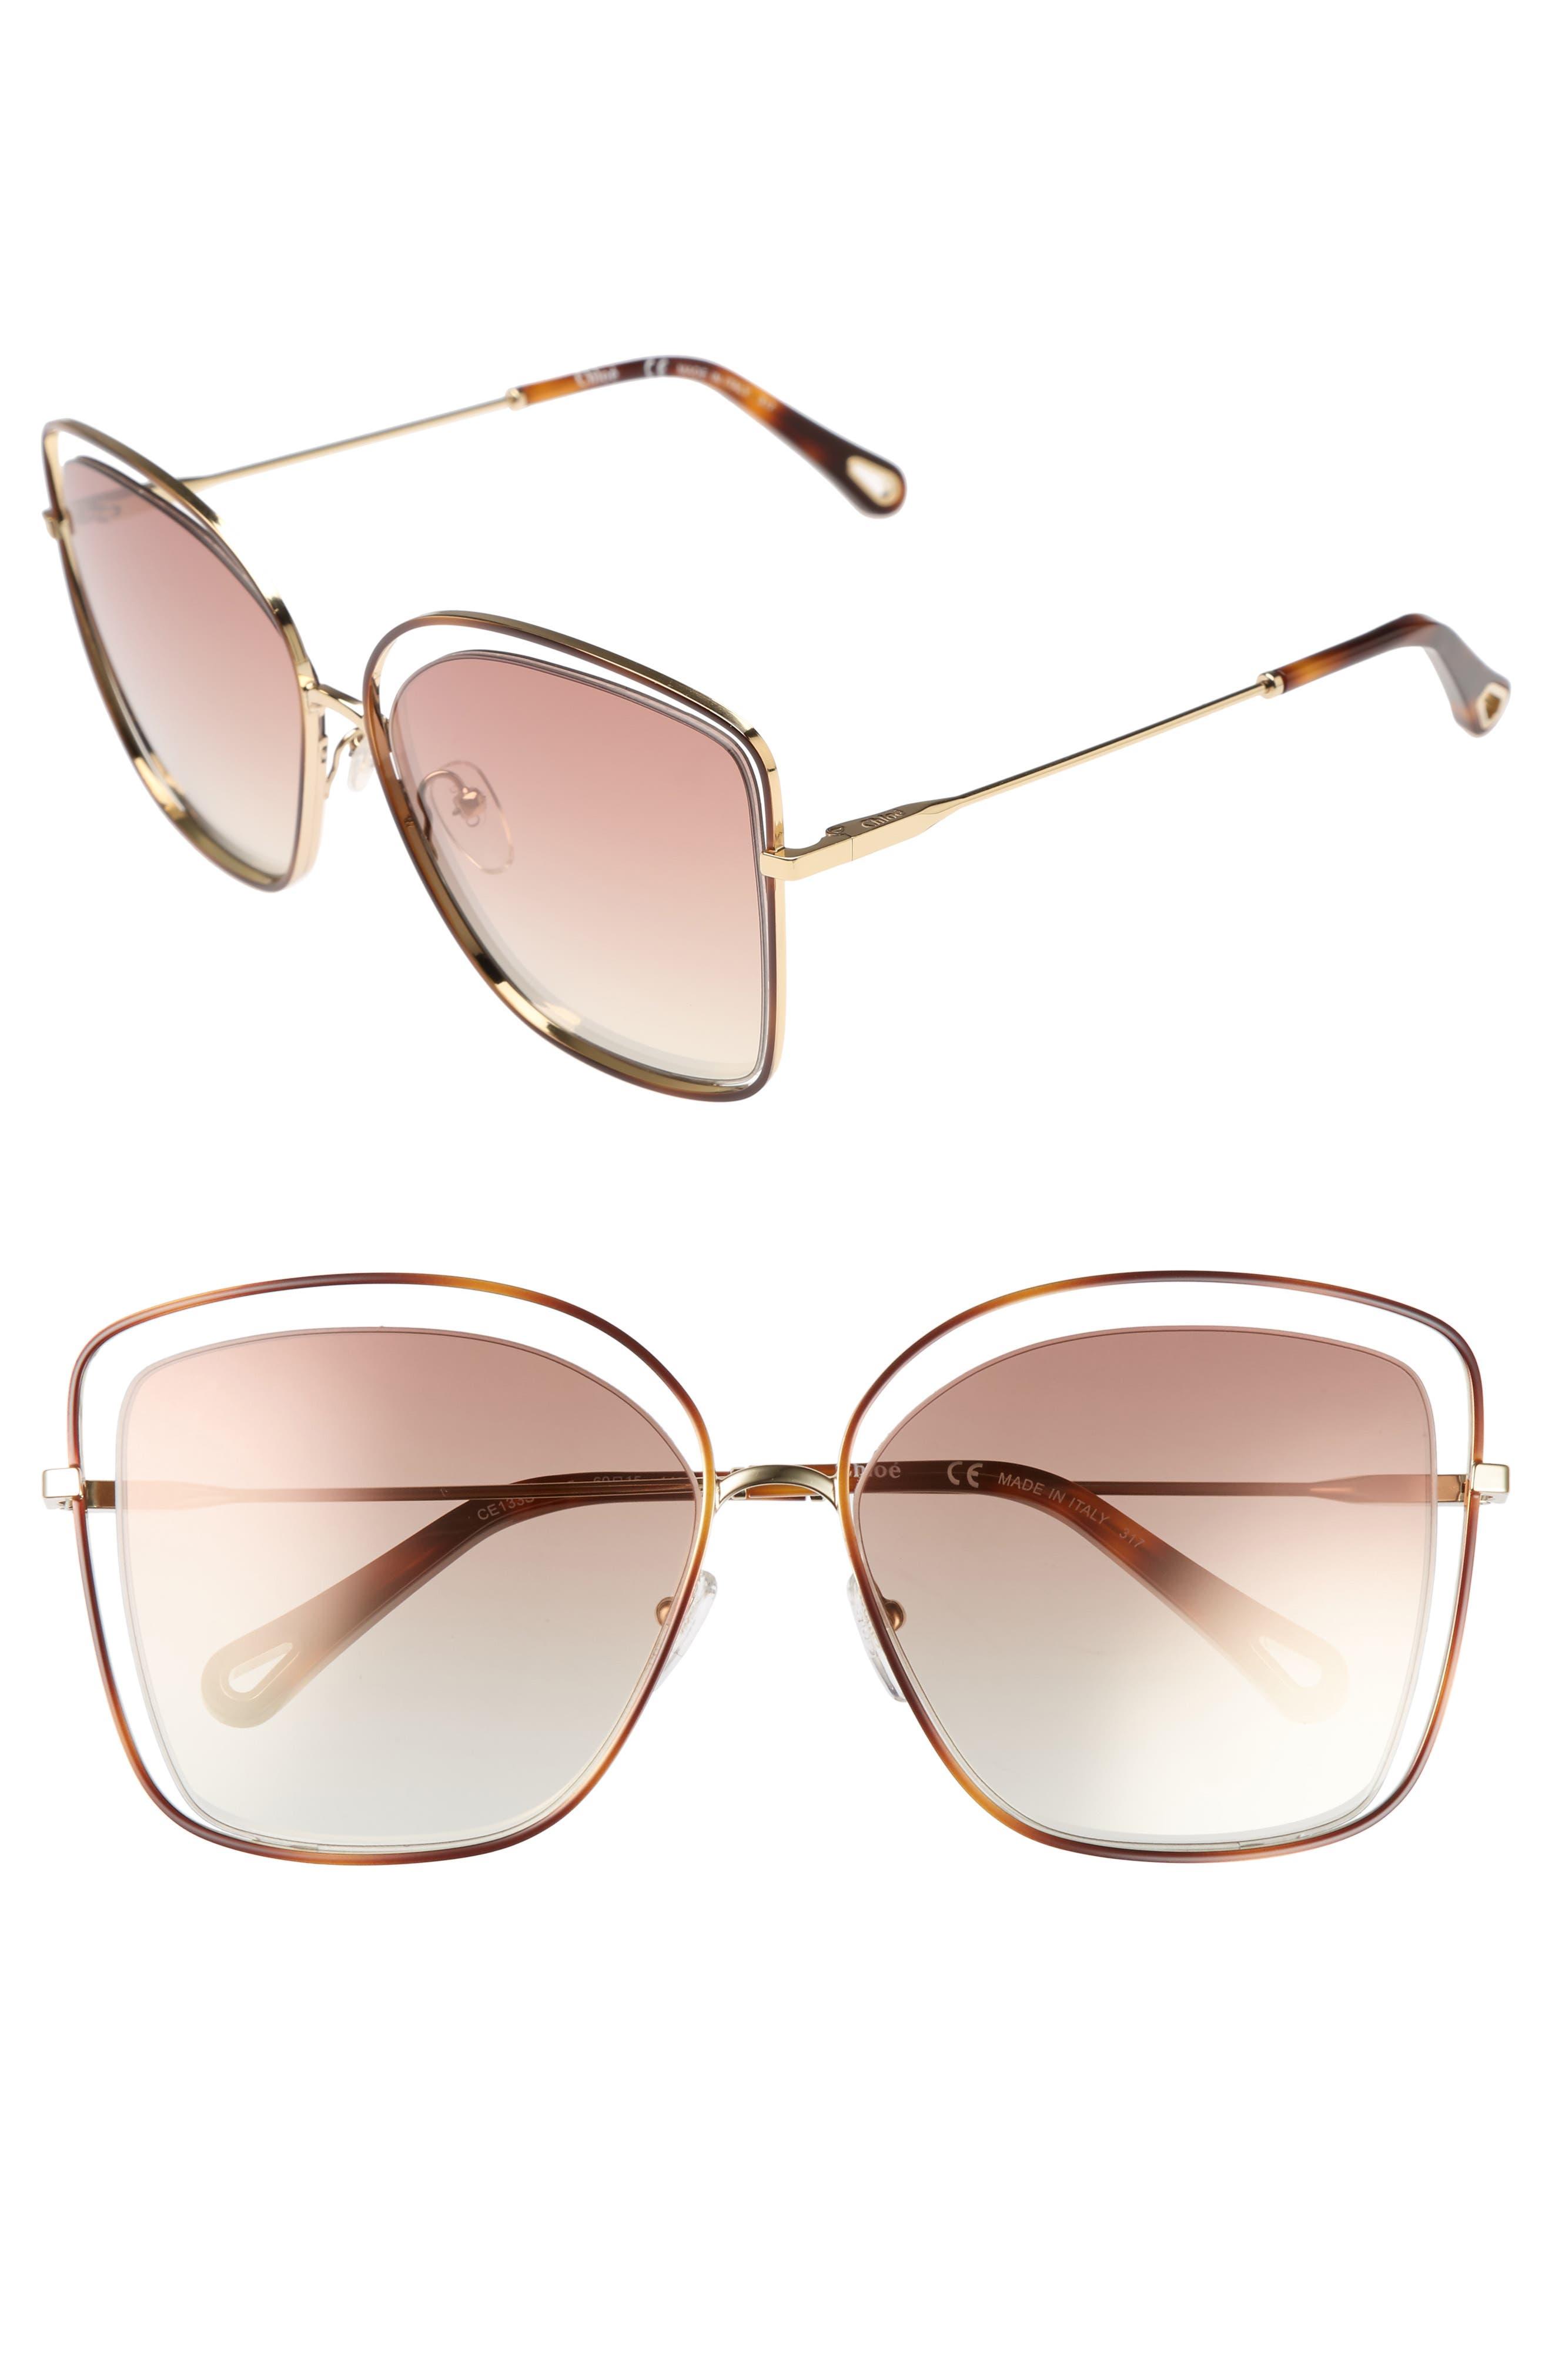 Main Image - Chloé 60mm Halo Frame Sunglasses